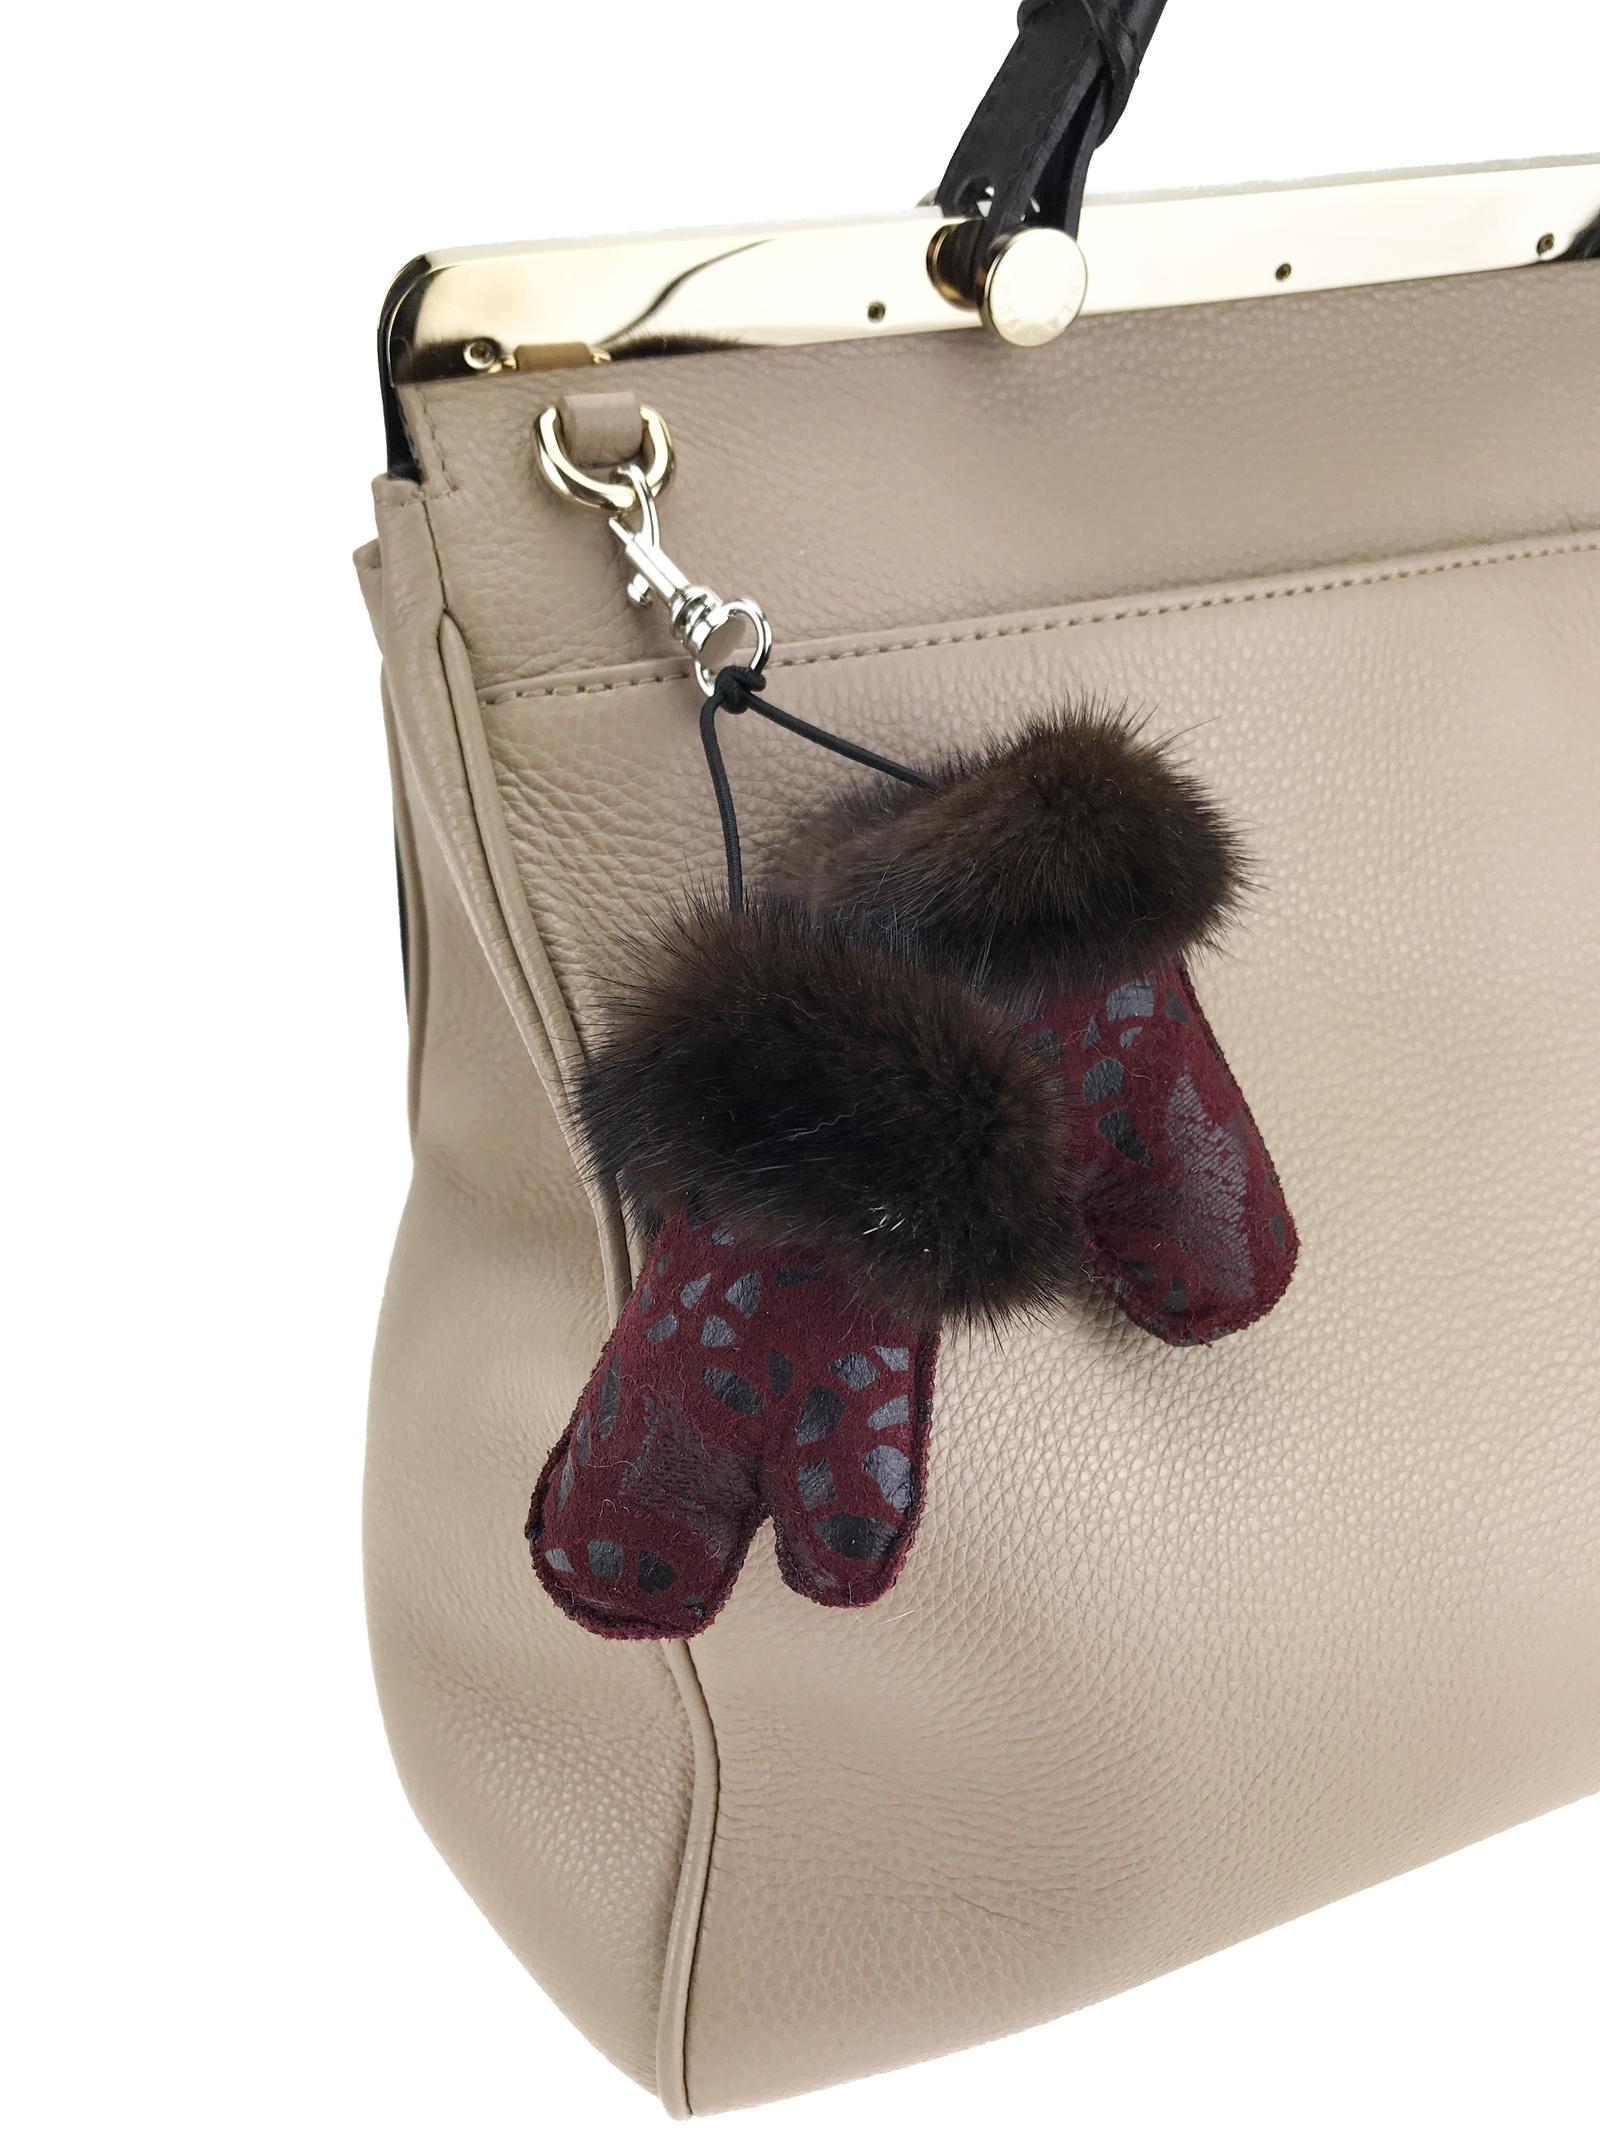 купить Брелок для сумки Mex-Style Брелок-рукавички, бордовый по цене 1010 рублей